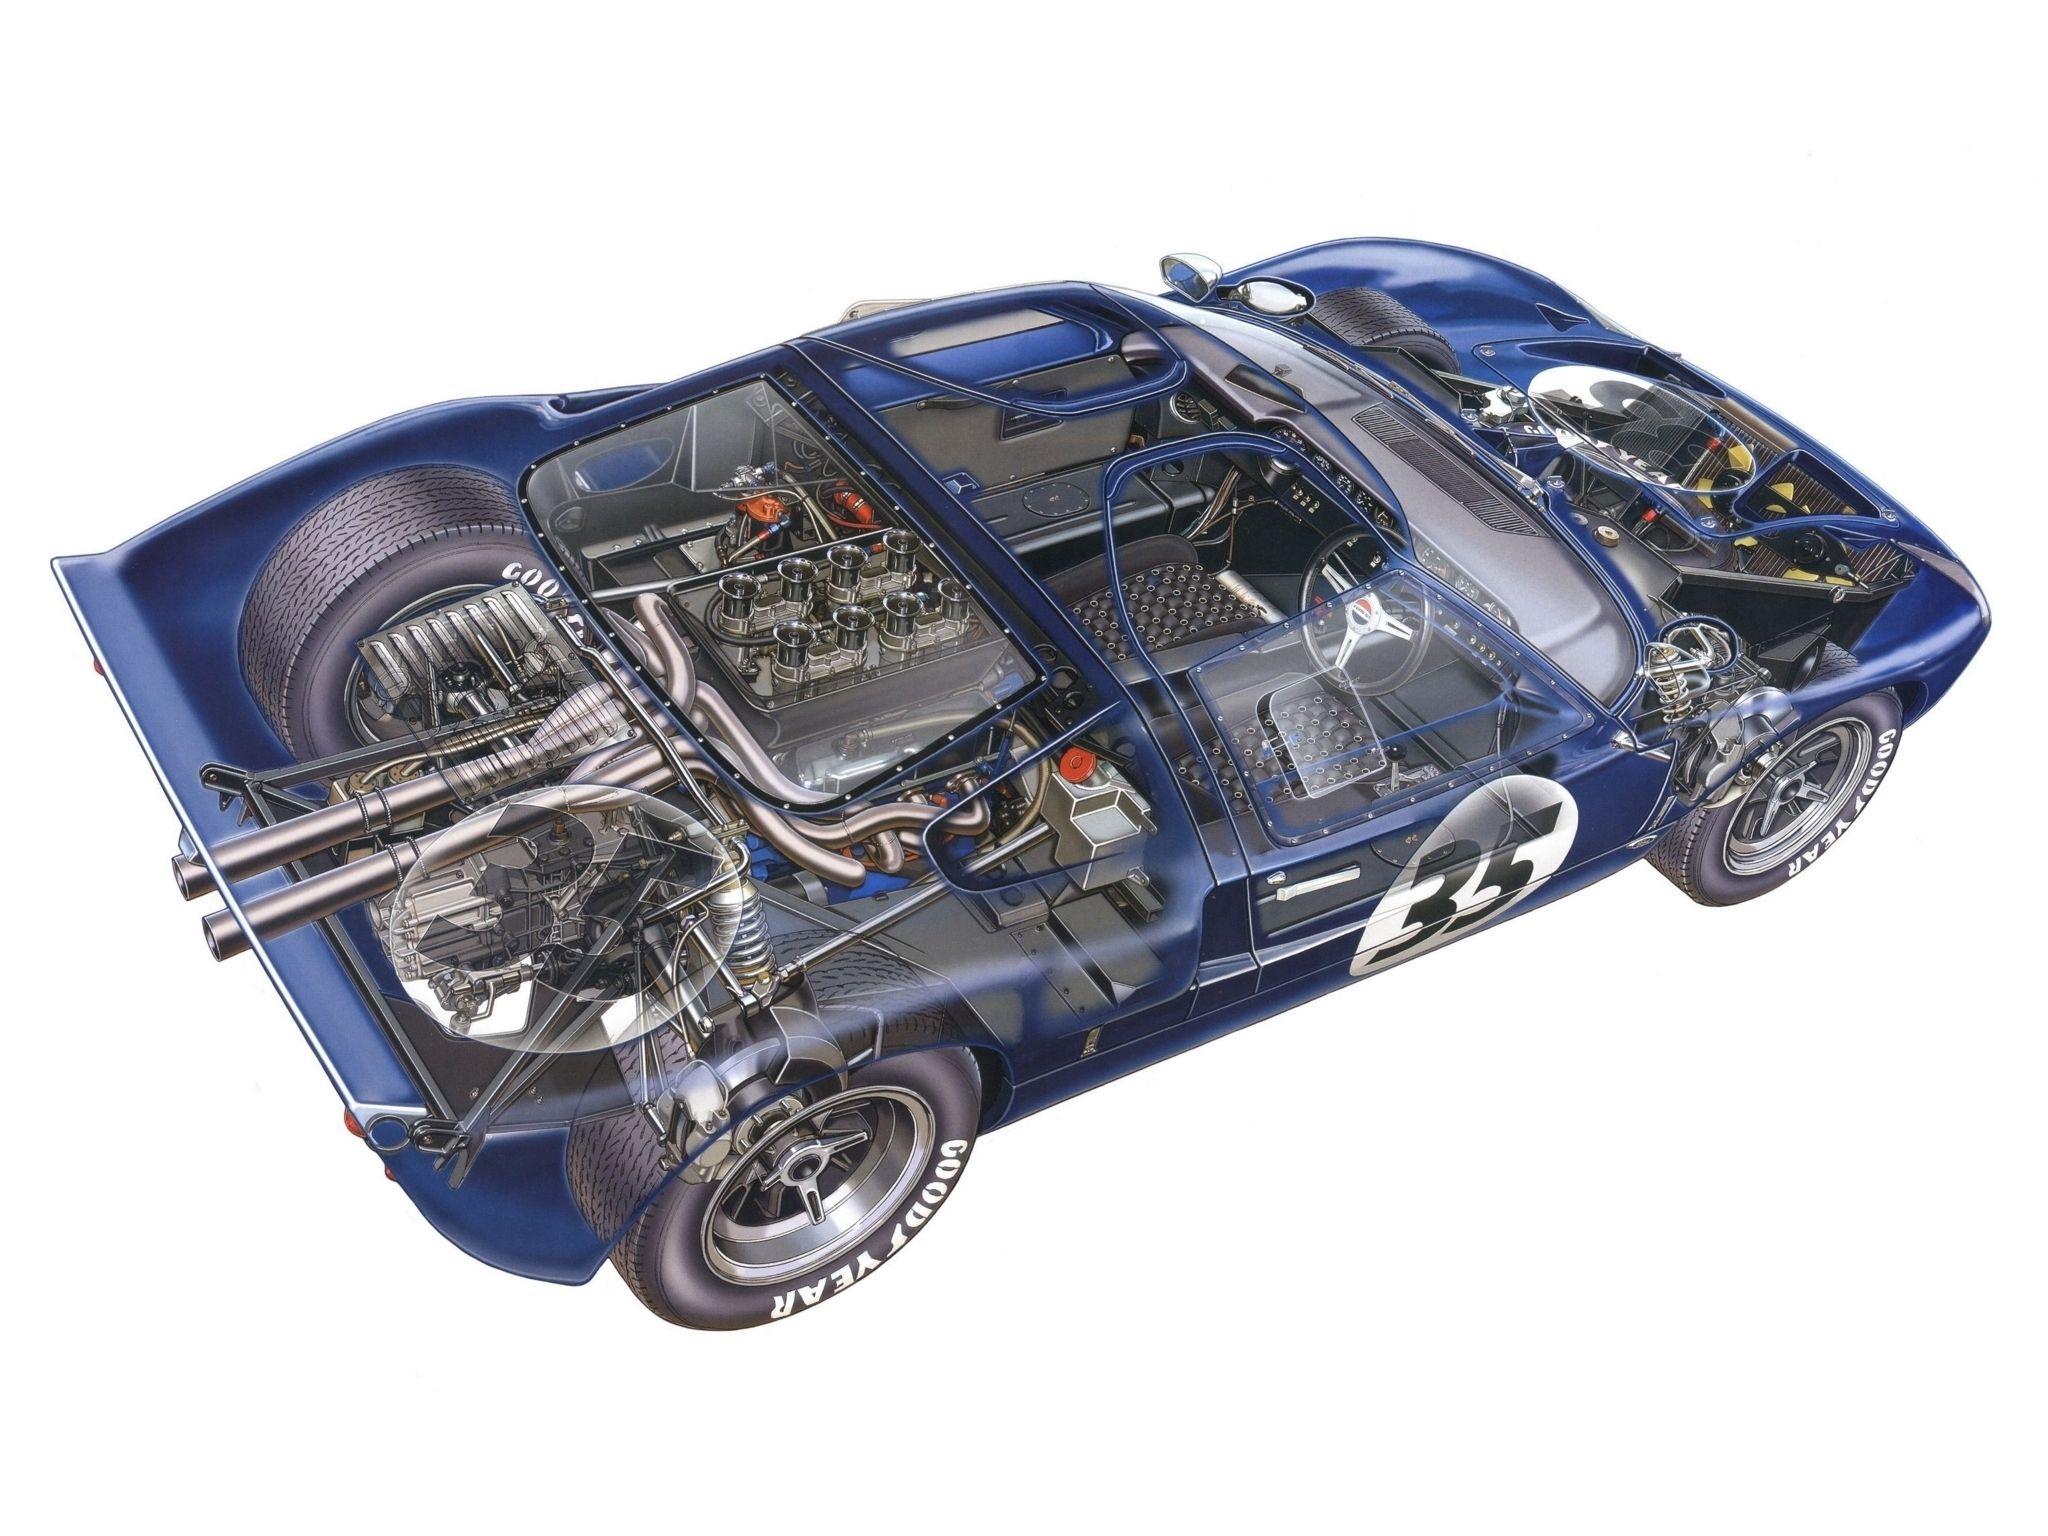 1965 66 ford gt40 mkii cutaway by david kimble unverified